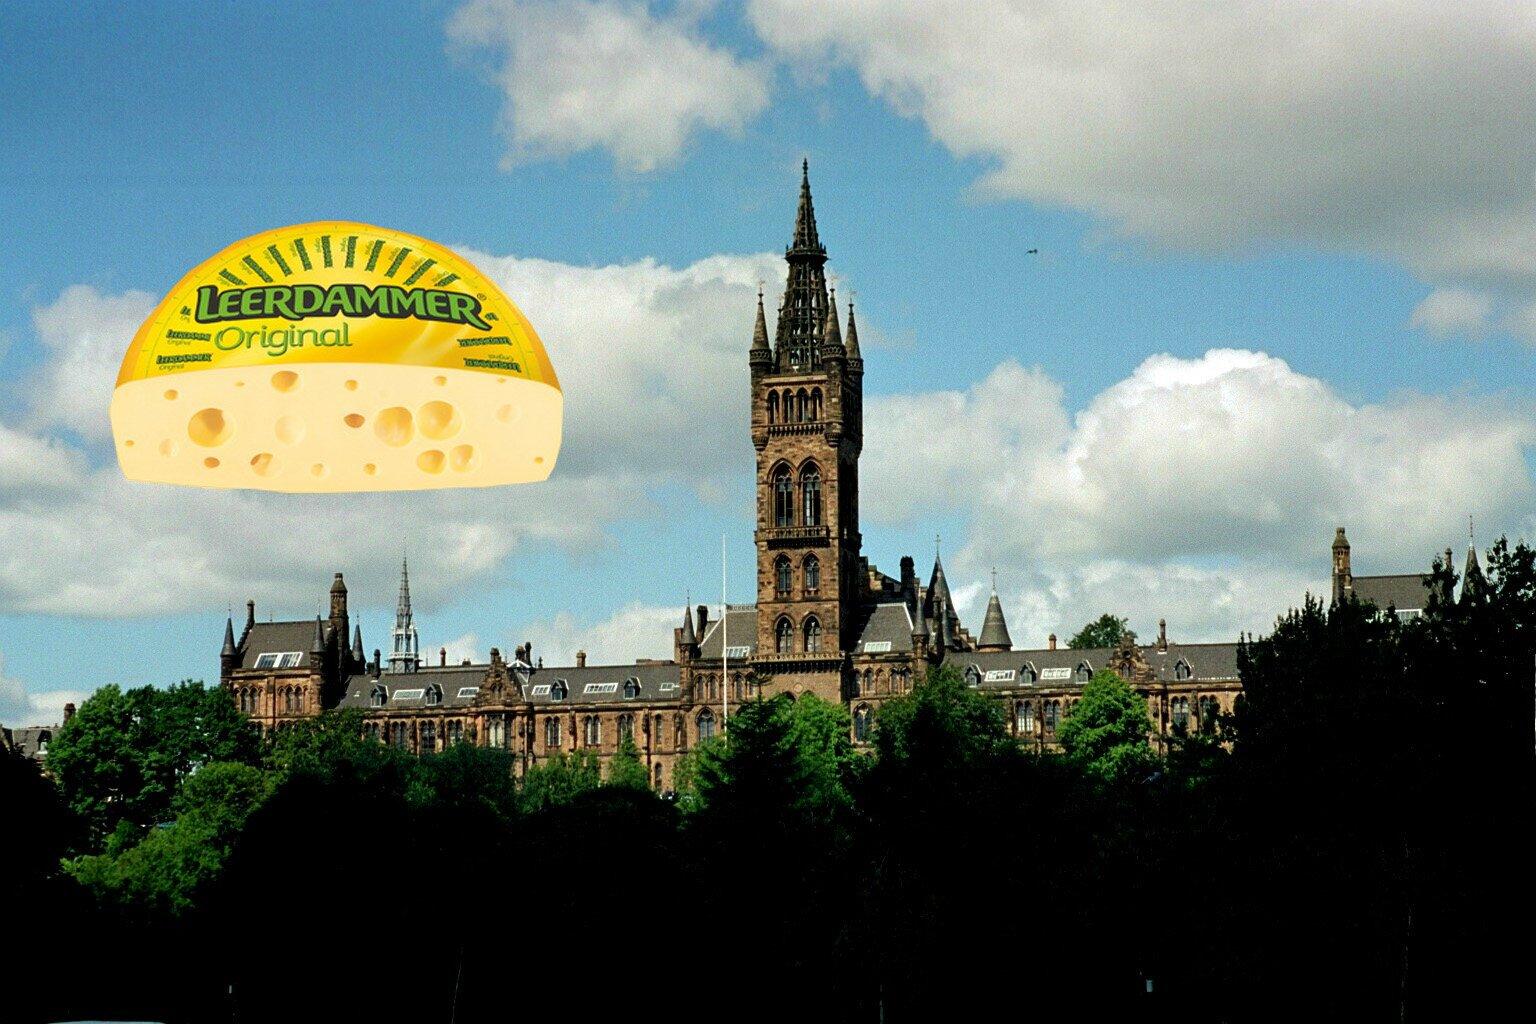 GlasgowLeerdammer